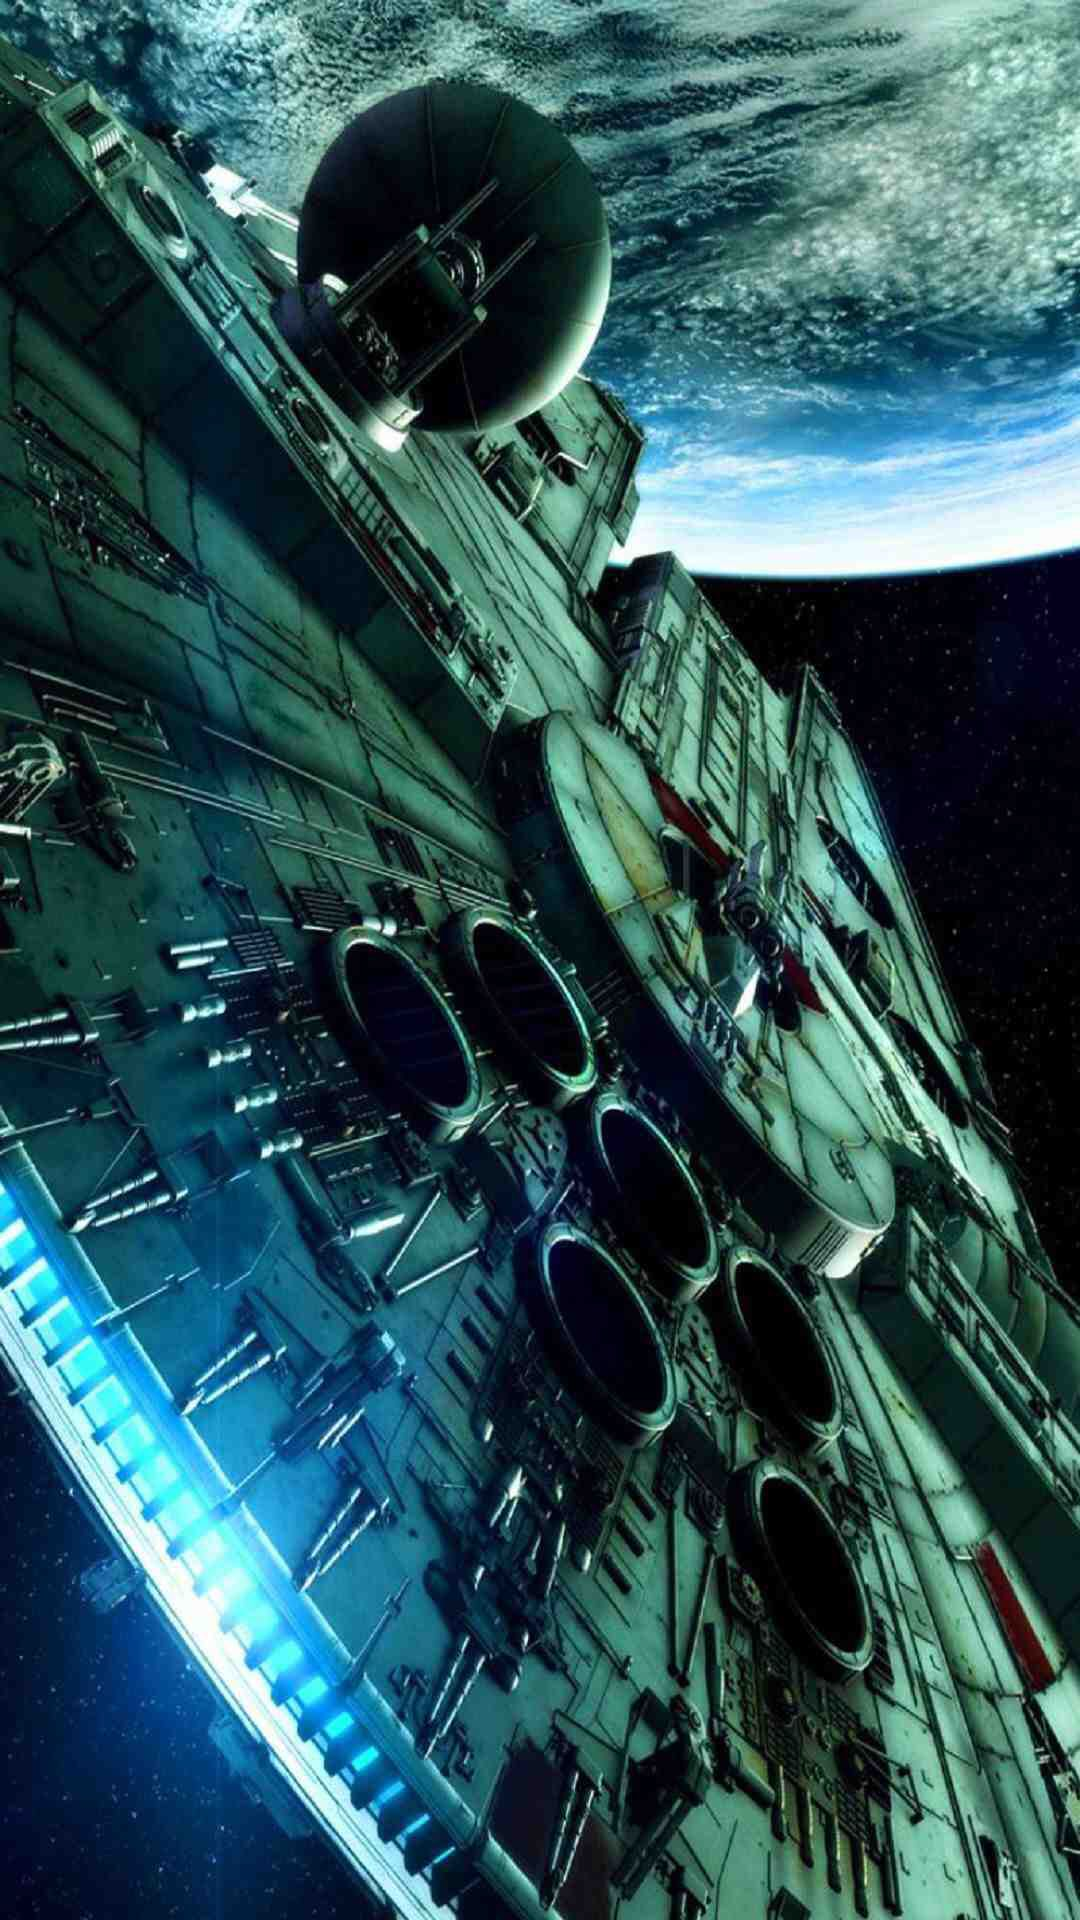 Millennium Falcon Star Wars Spaceships Star Wars Wallpaper Star Wars Ships